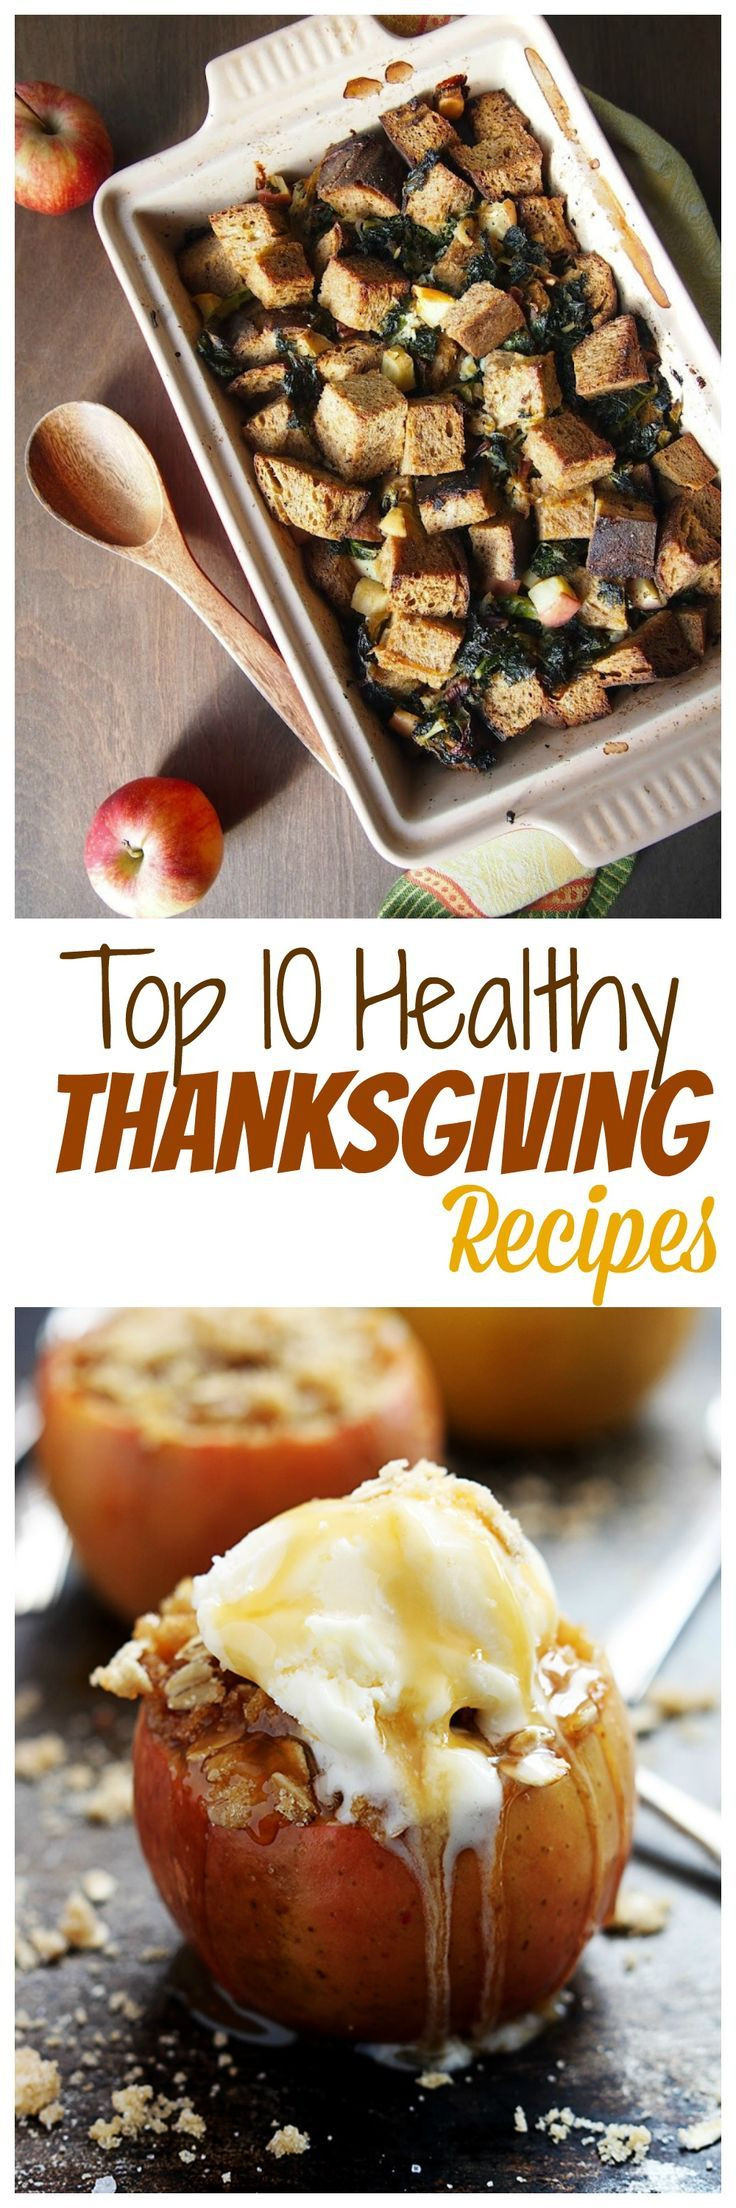 Low Calorie Thanksgiving Desserts  10 Best Healthy Thanksgiving Recipes for Low Calorie Sides